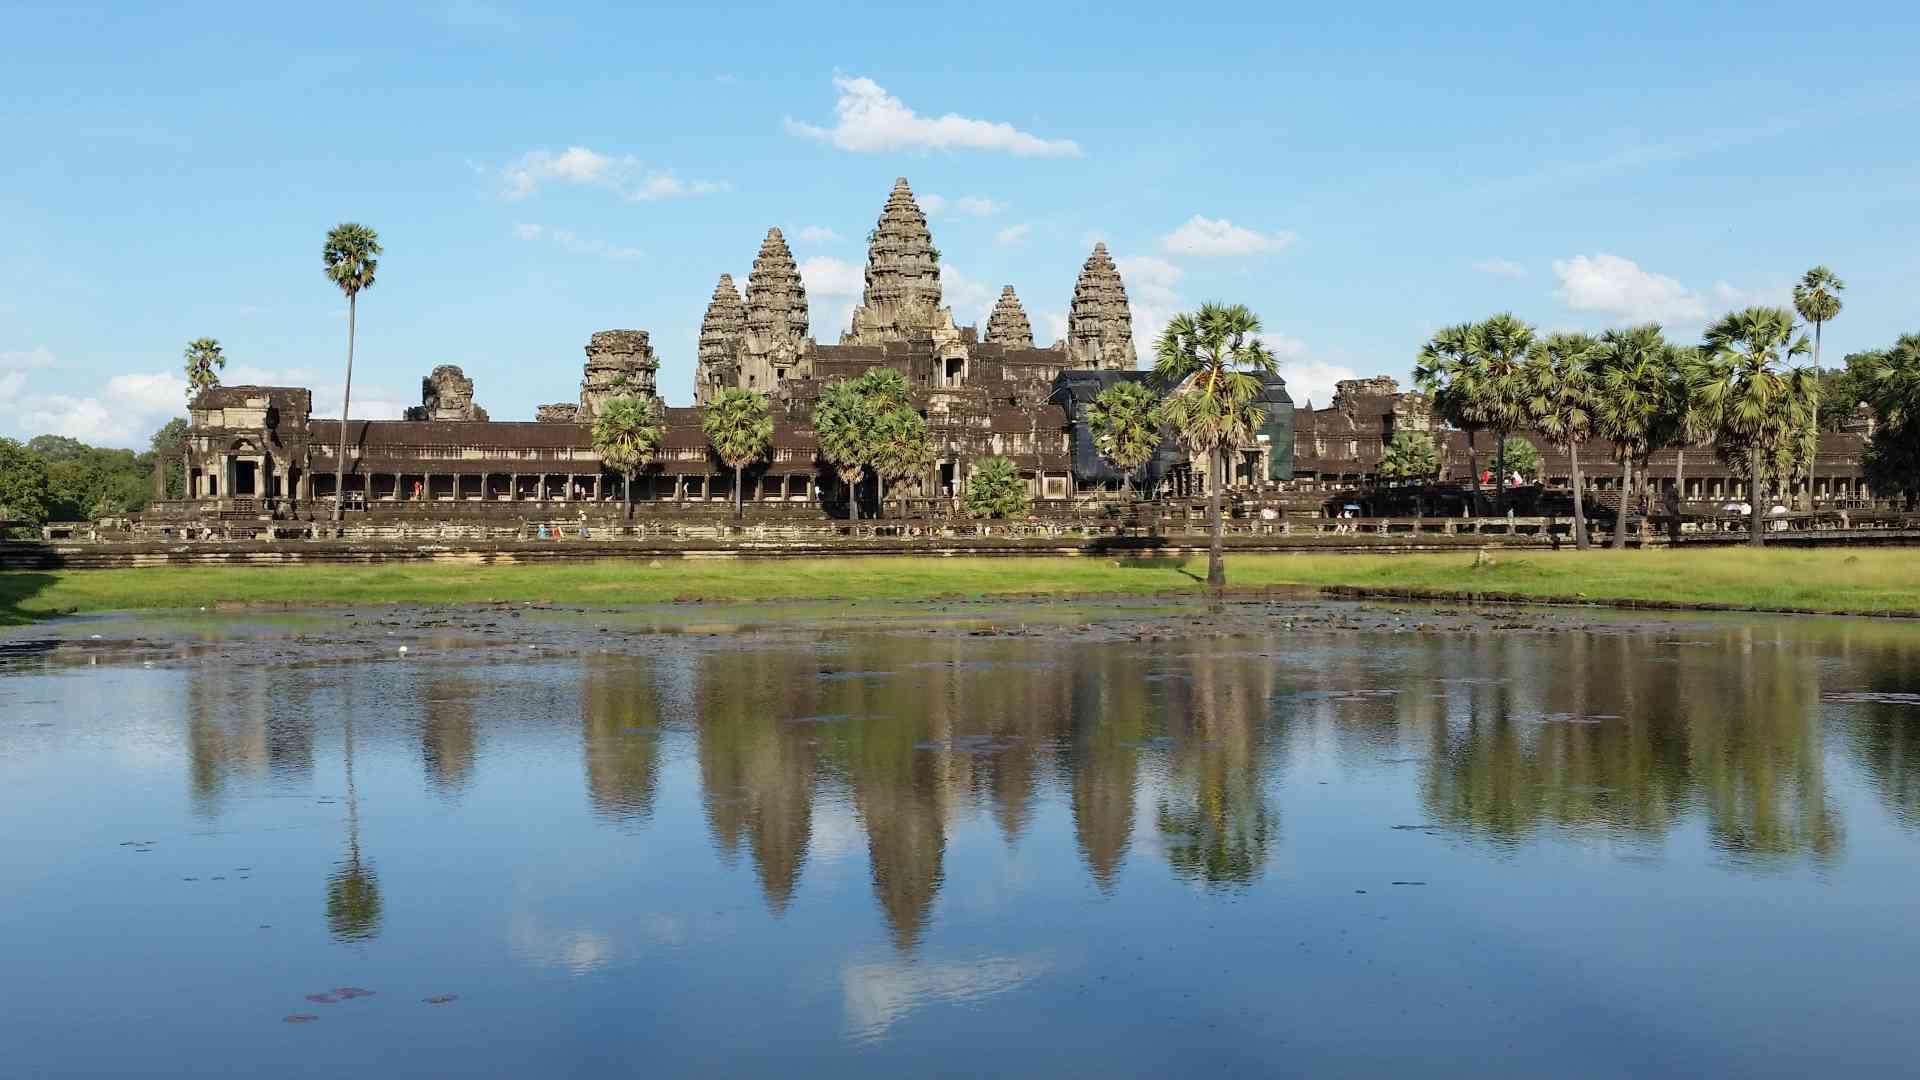 Angkor Wat, Cambodia by Dennis Bunnik